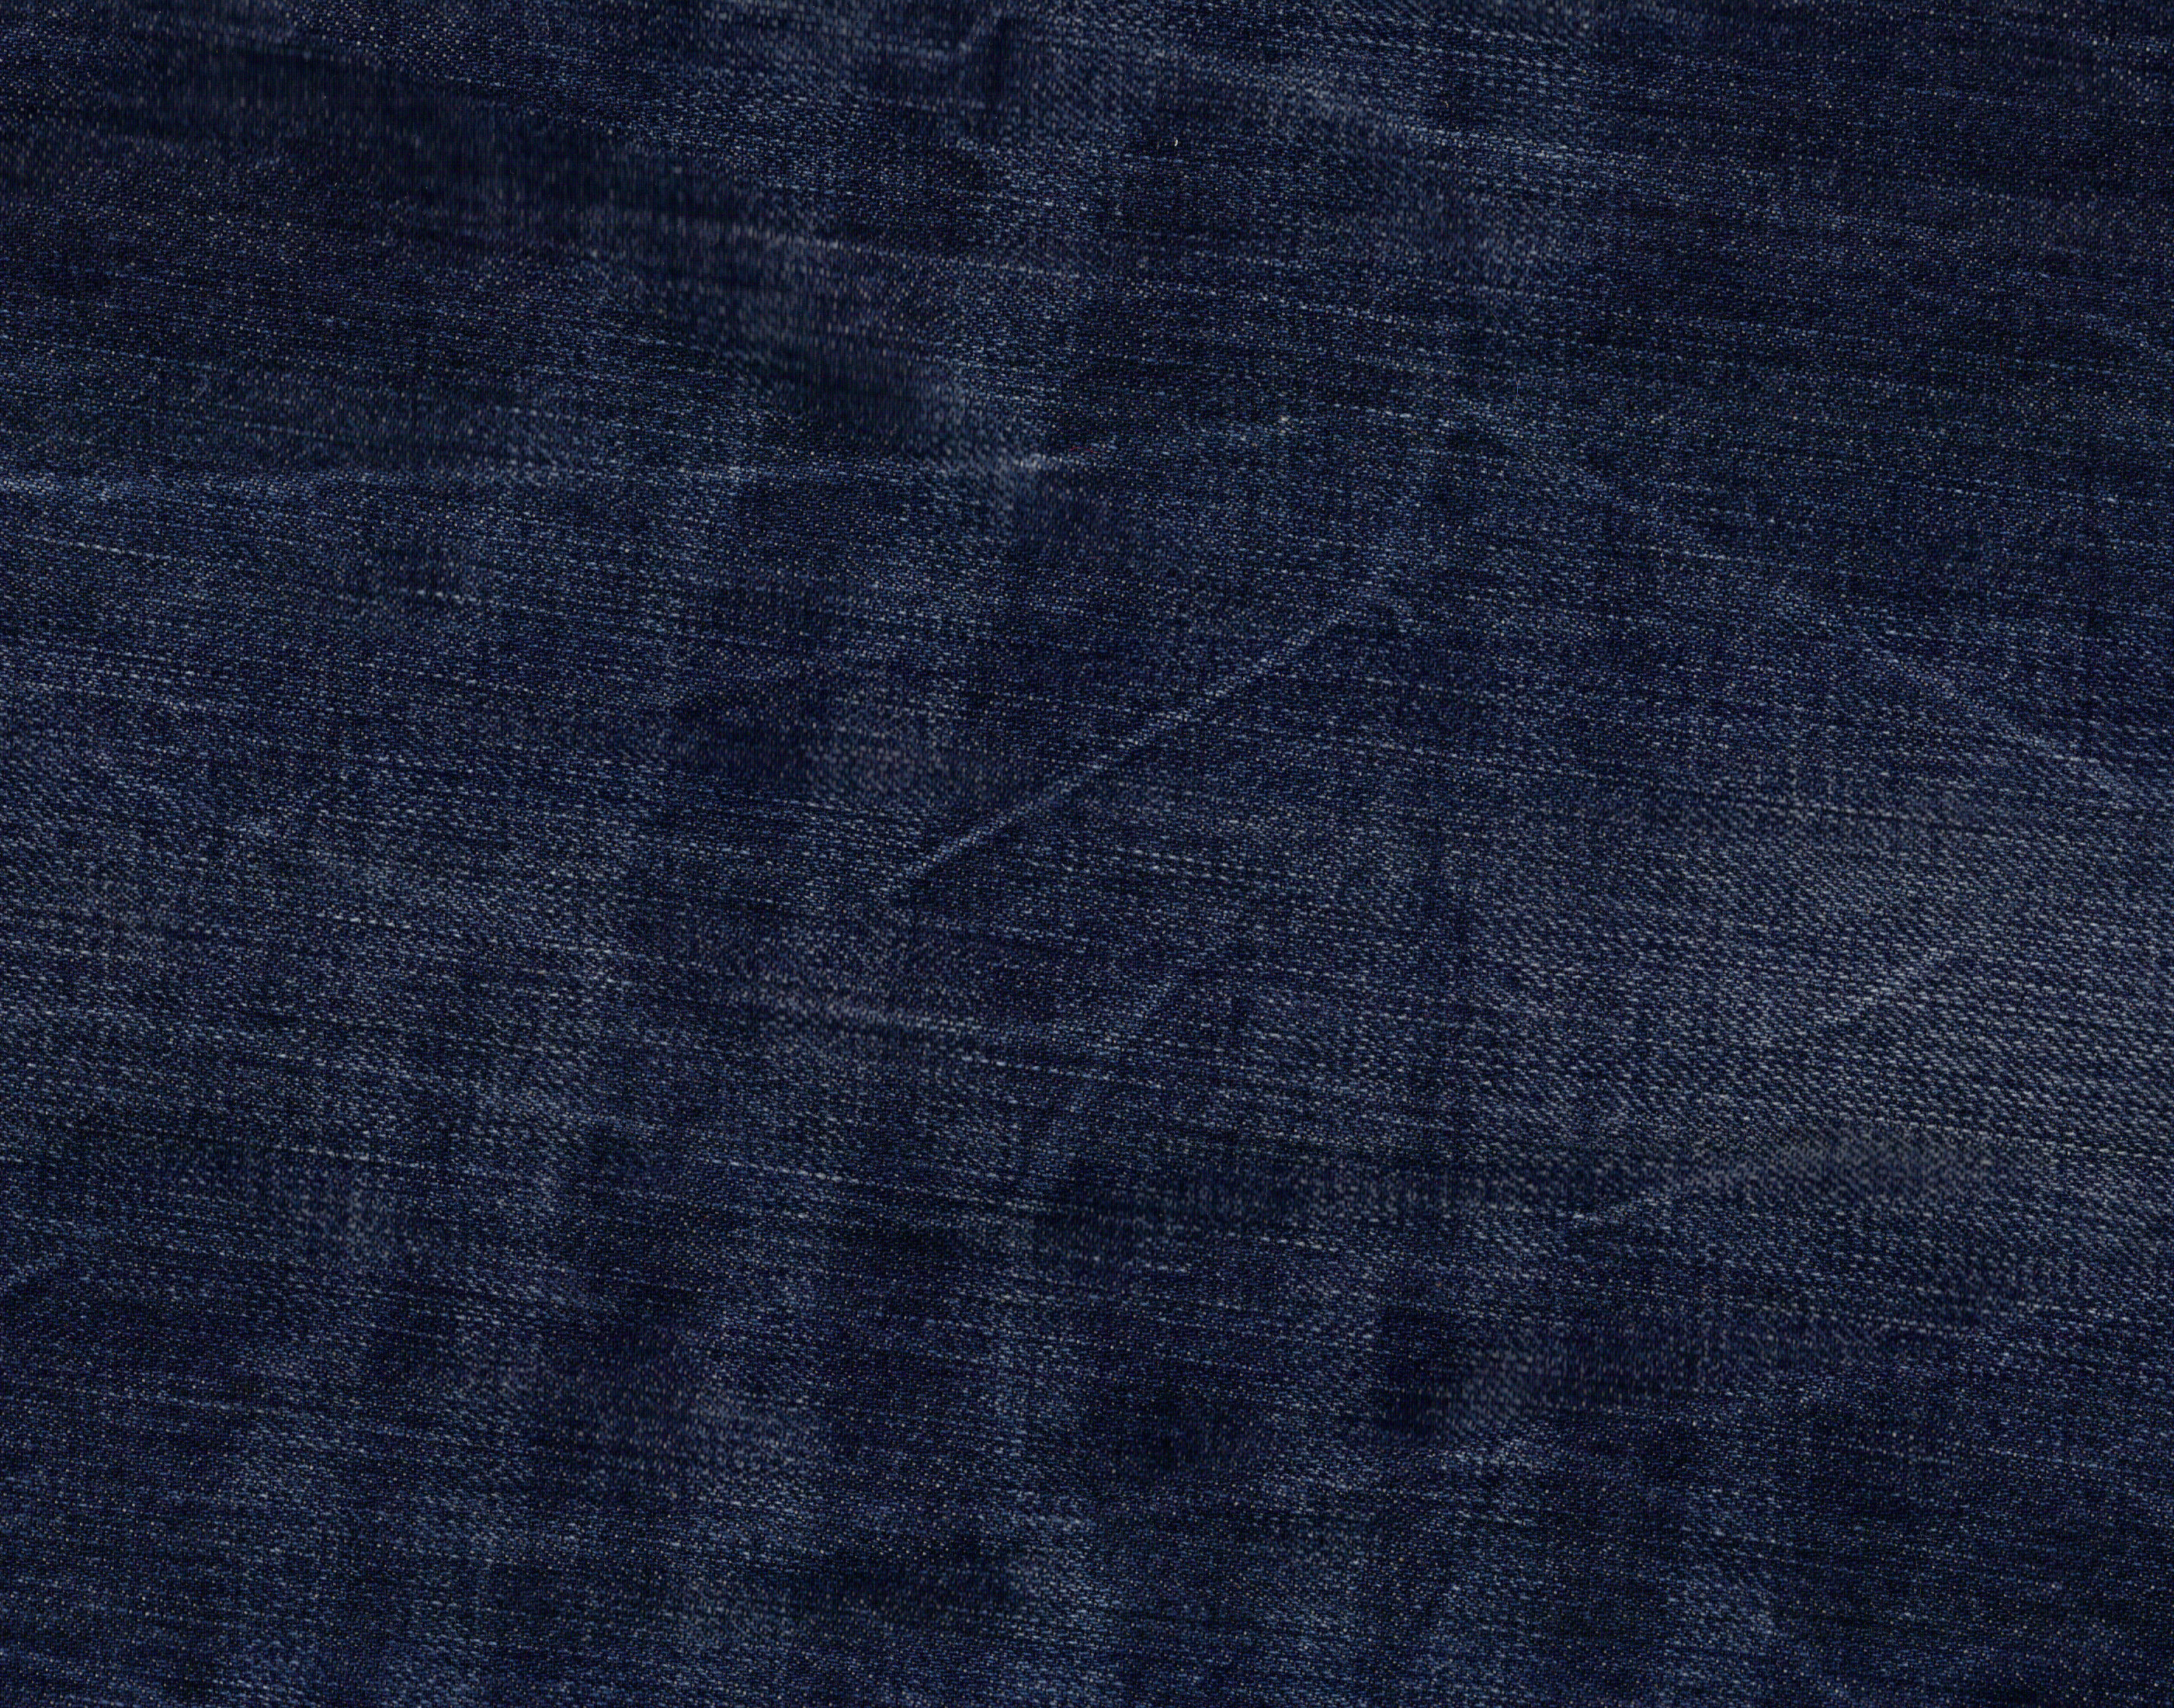 4 Denim Jeans Texture Set (JPG) | OnlyGFX.com